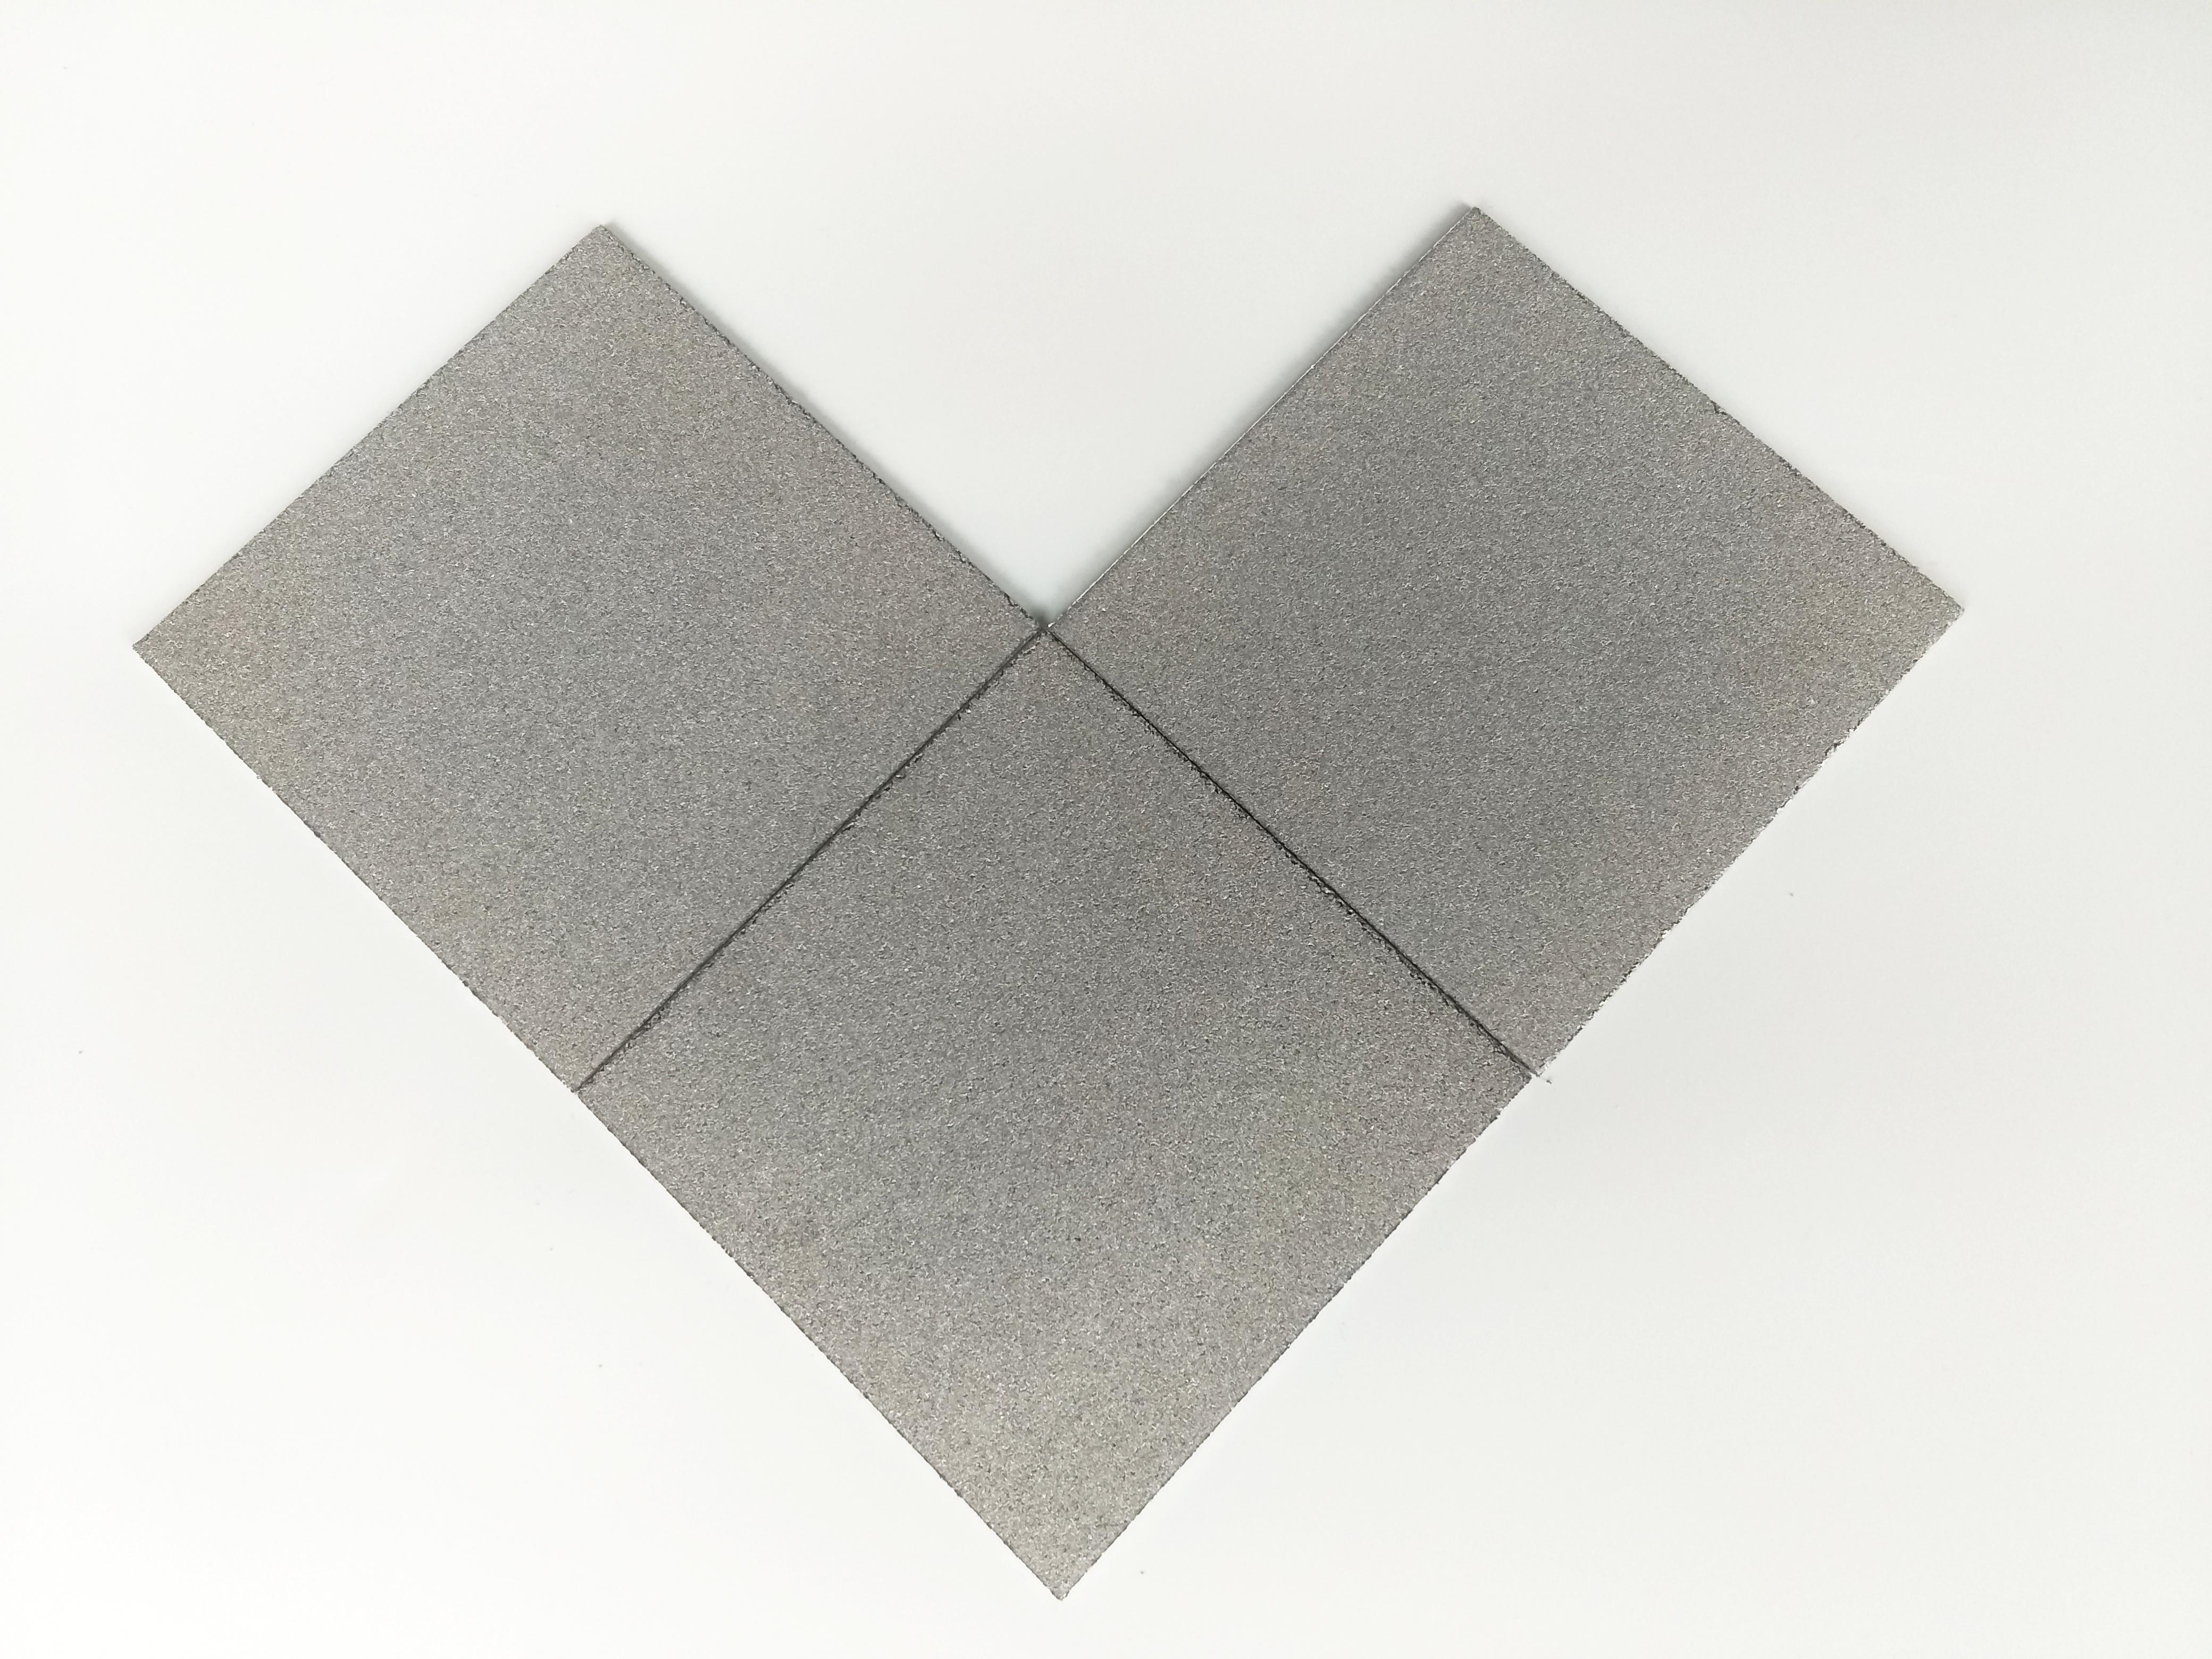 PEM水电解装置钛多孔电解板可带涂层